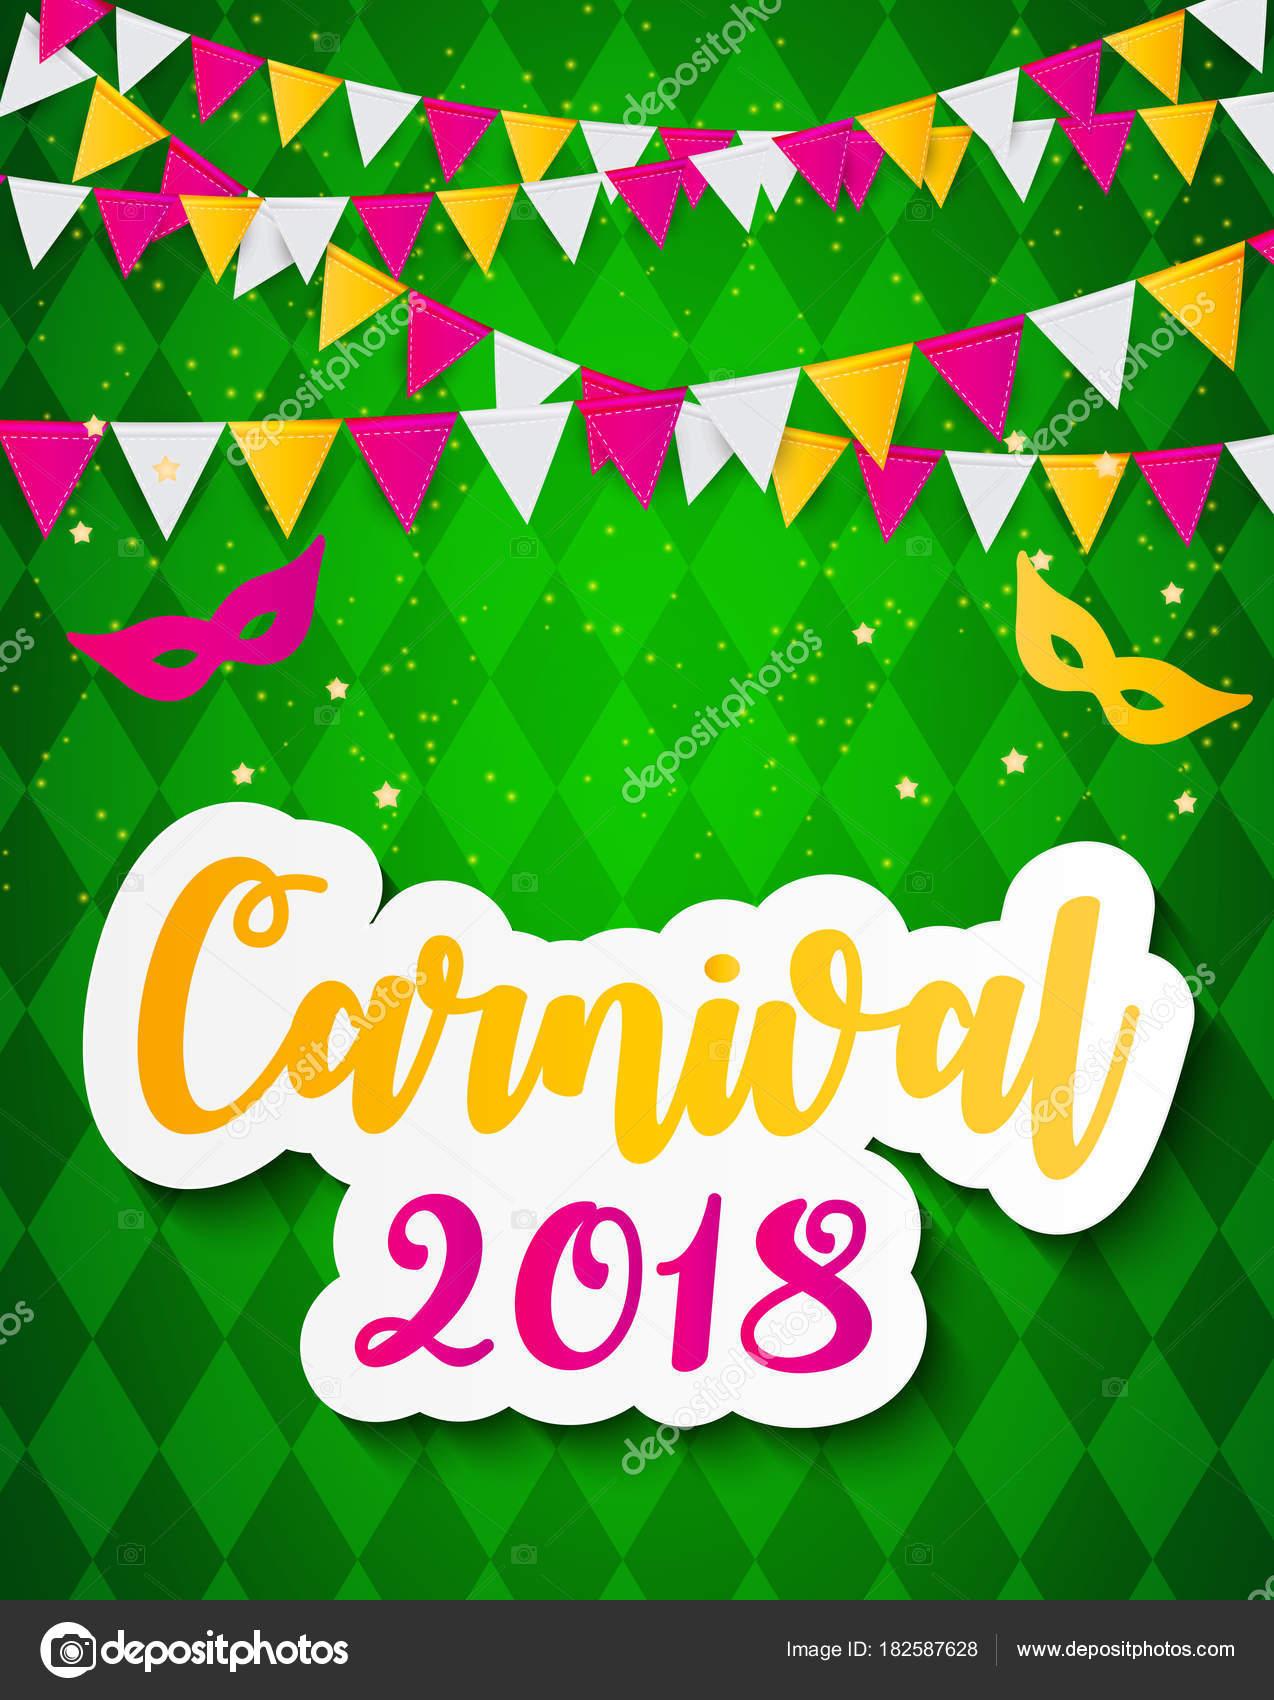 Carnival brochure template for brazil carnival in south america carnival brochure template for brazil carnival in south america celebration greeting card backround vecor illustration eps10 vector by oleggankod m4hsunfo